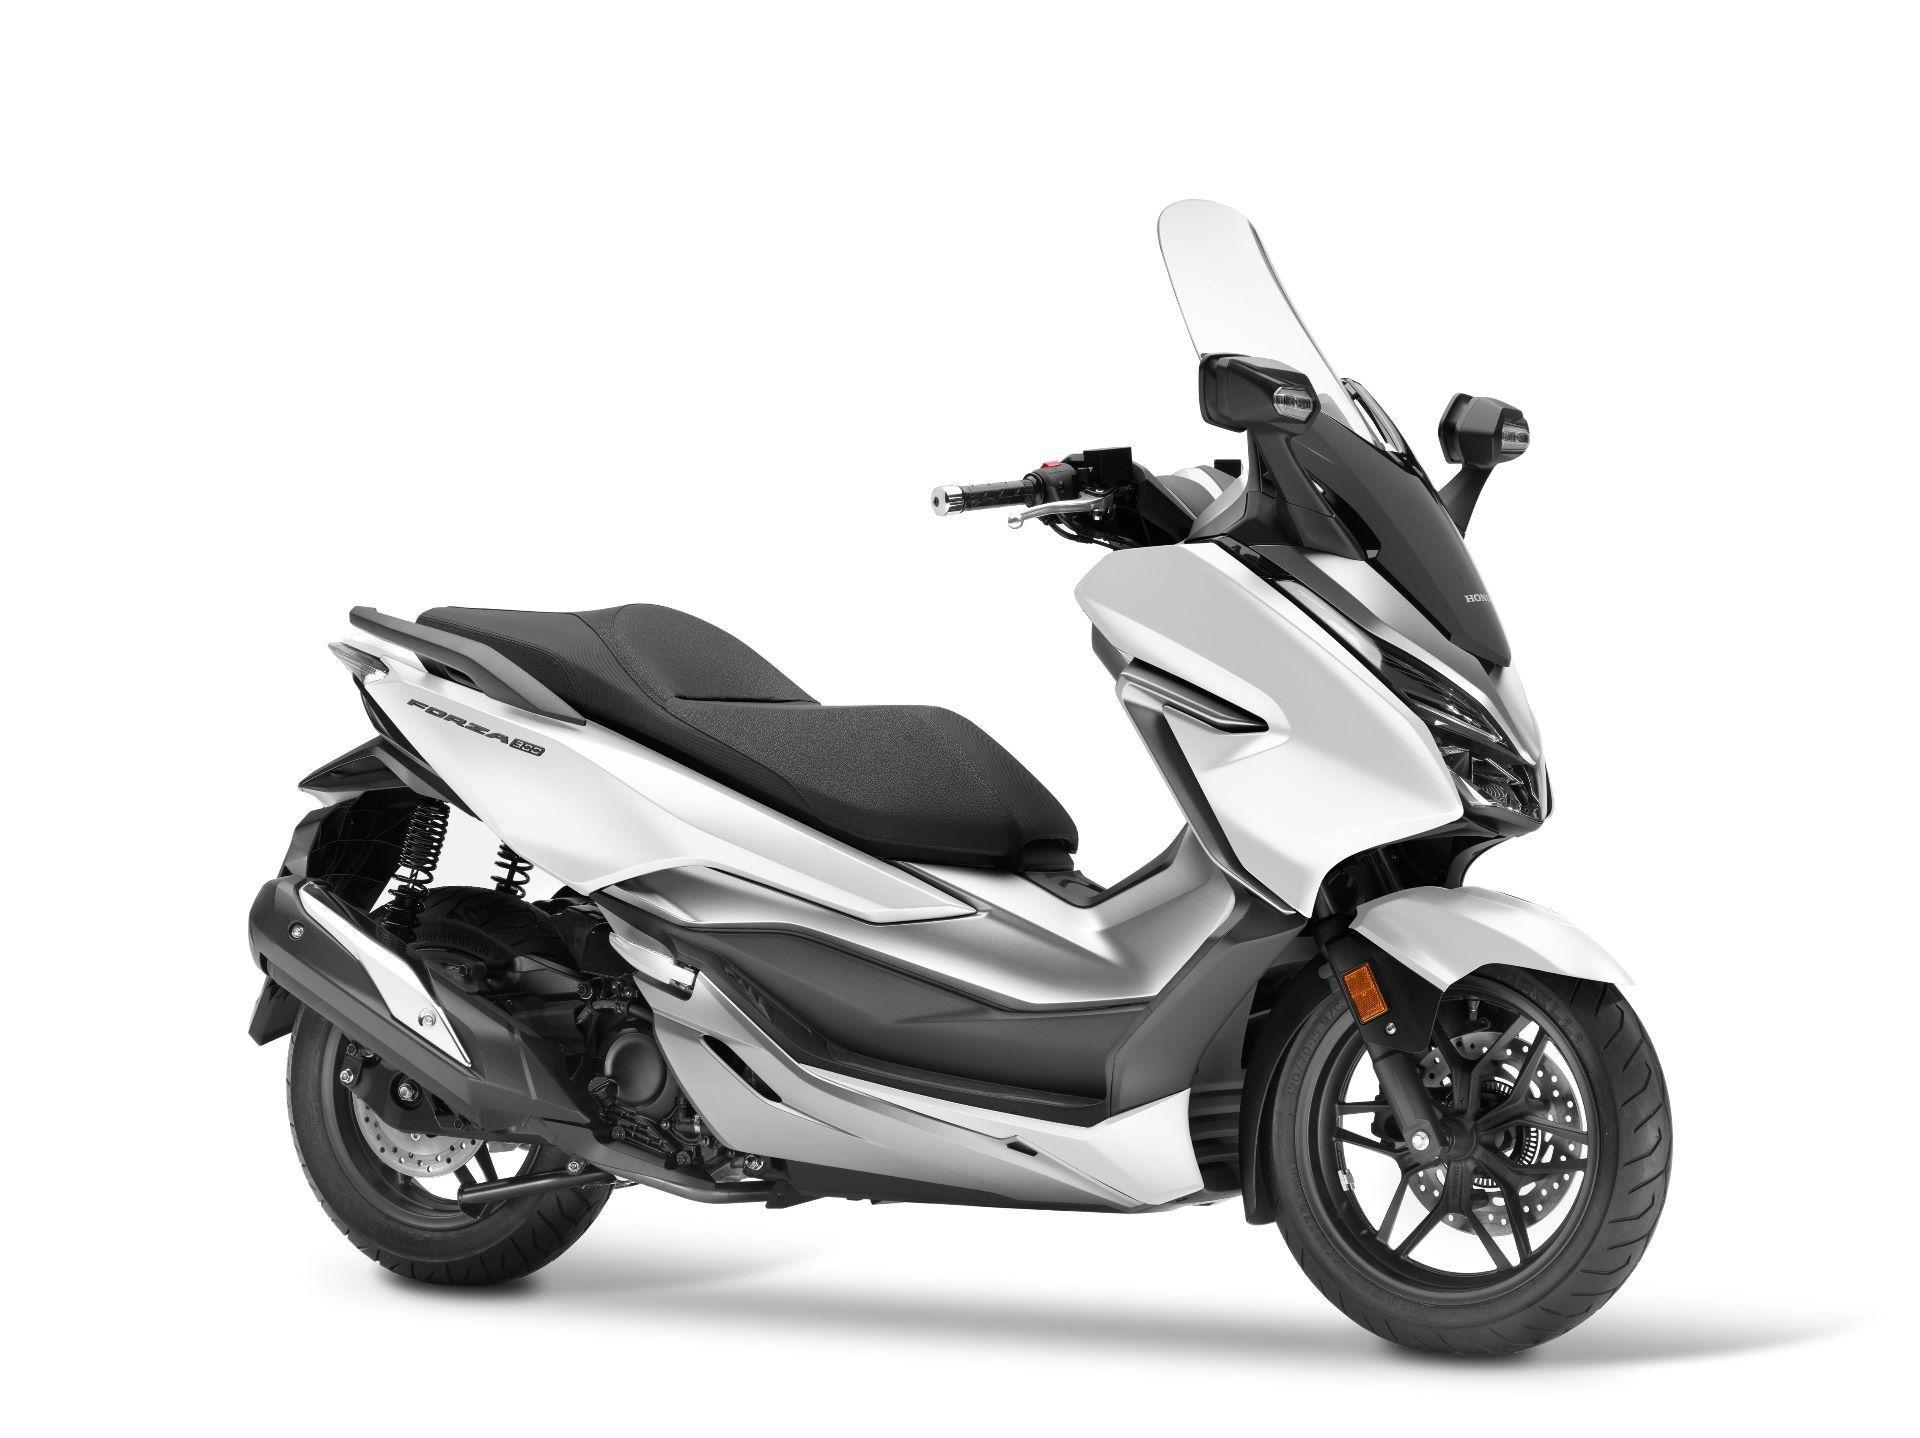 Buy Motorbike New Vehiclebike Honda Nss 300 A Forza Neu 2019